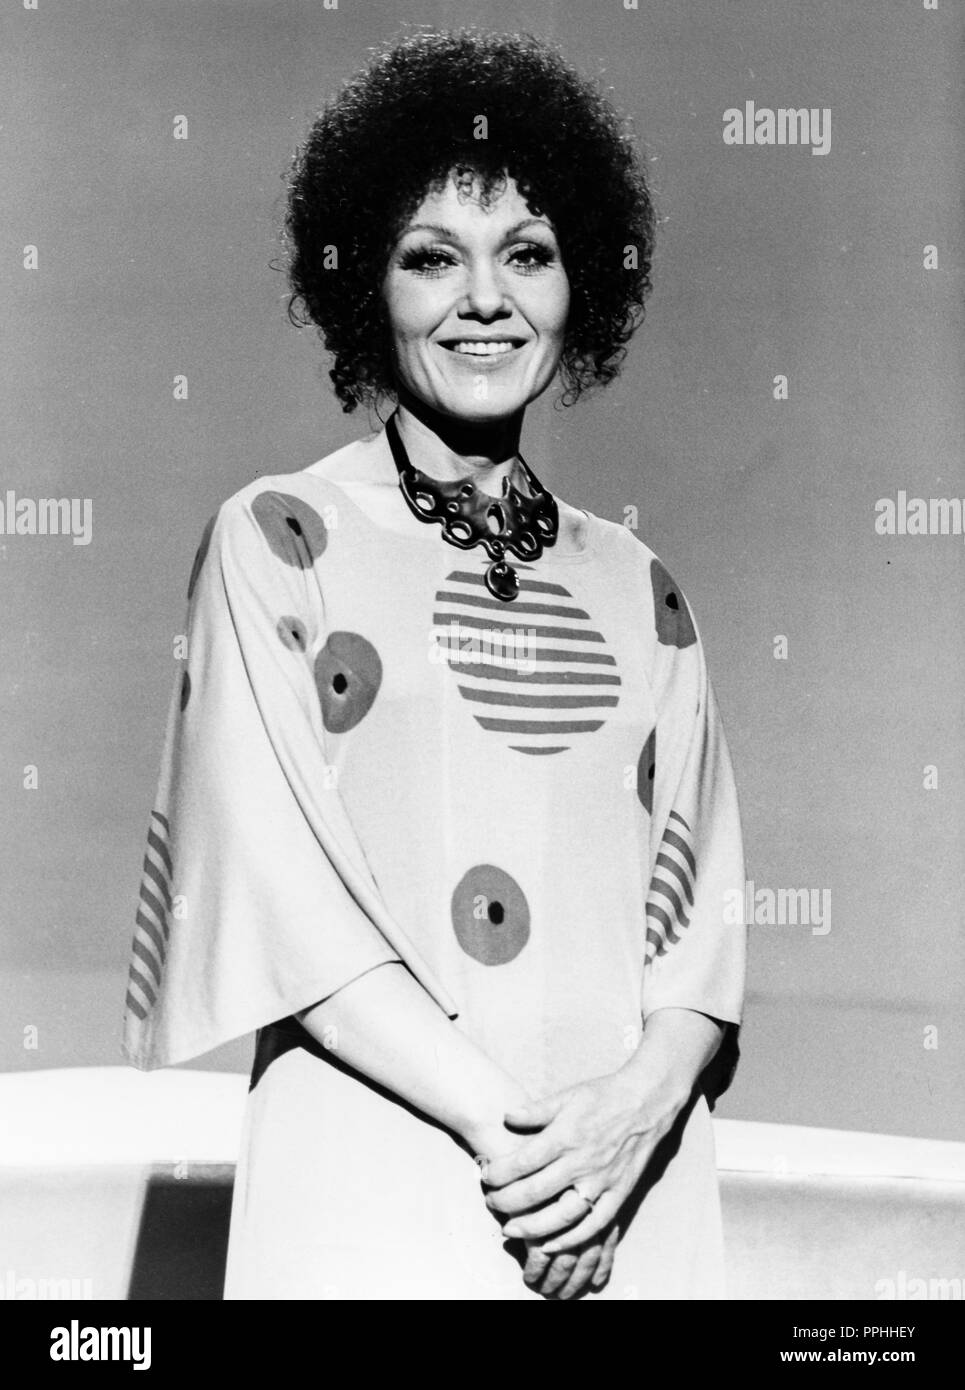 Cleo Laine (born 1927) Cleo Laine (born 1927) new photo